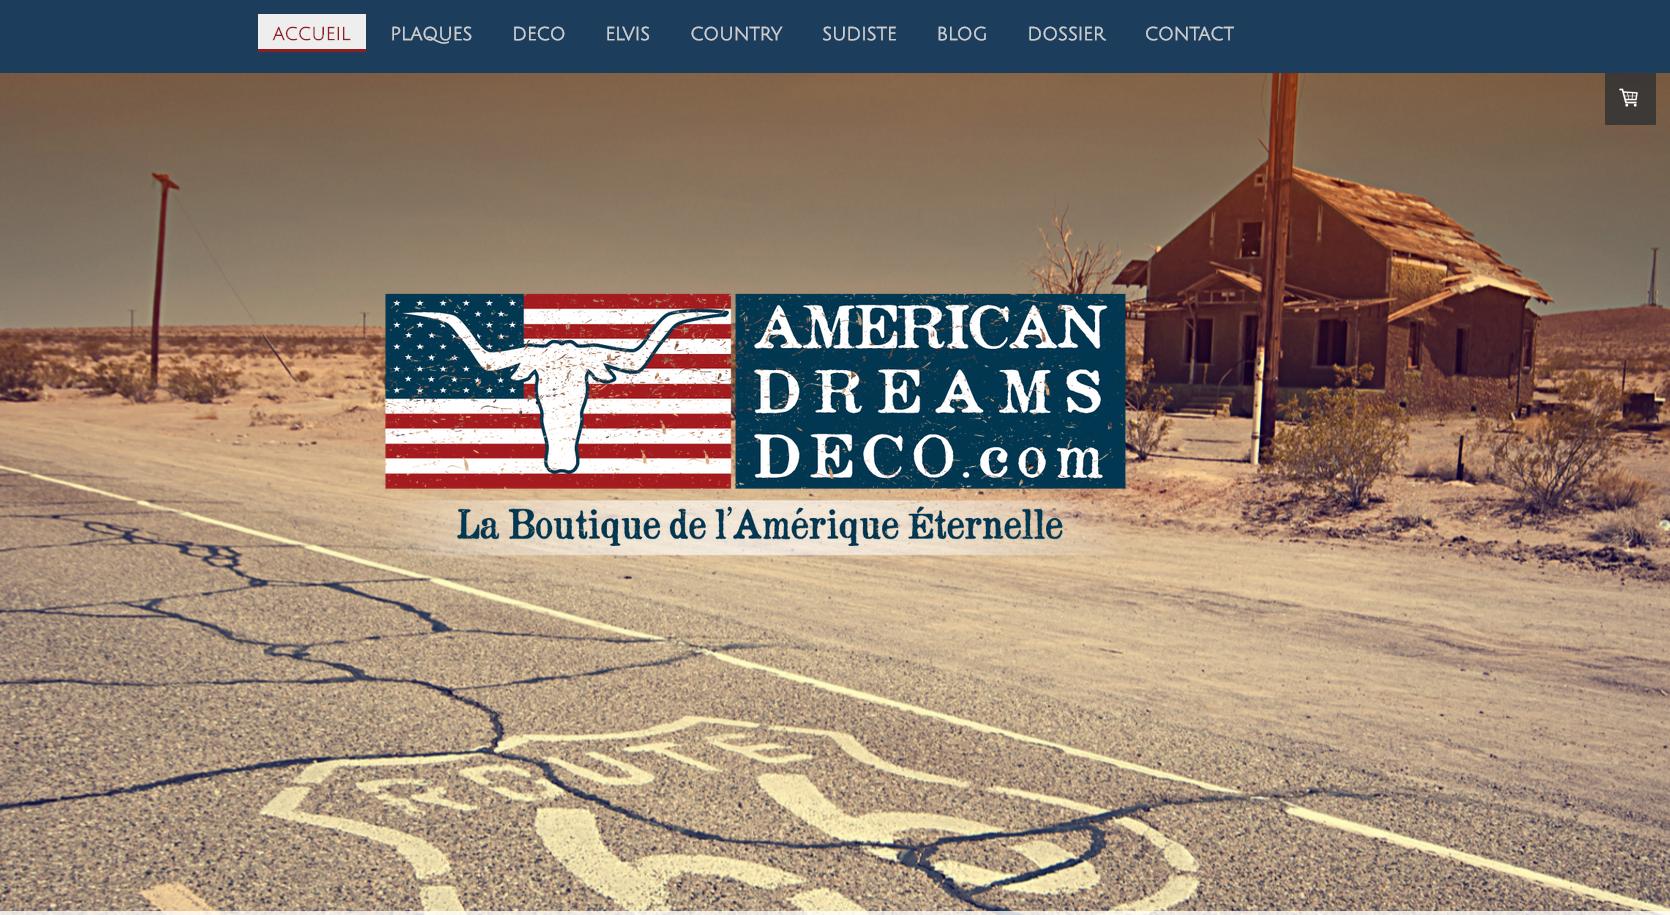 http://www.american-dreams-deco.com/